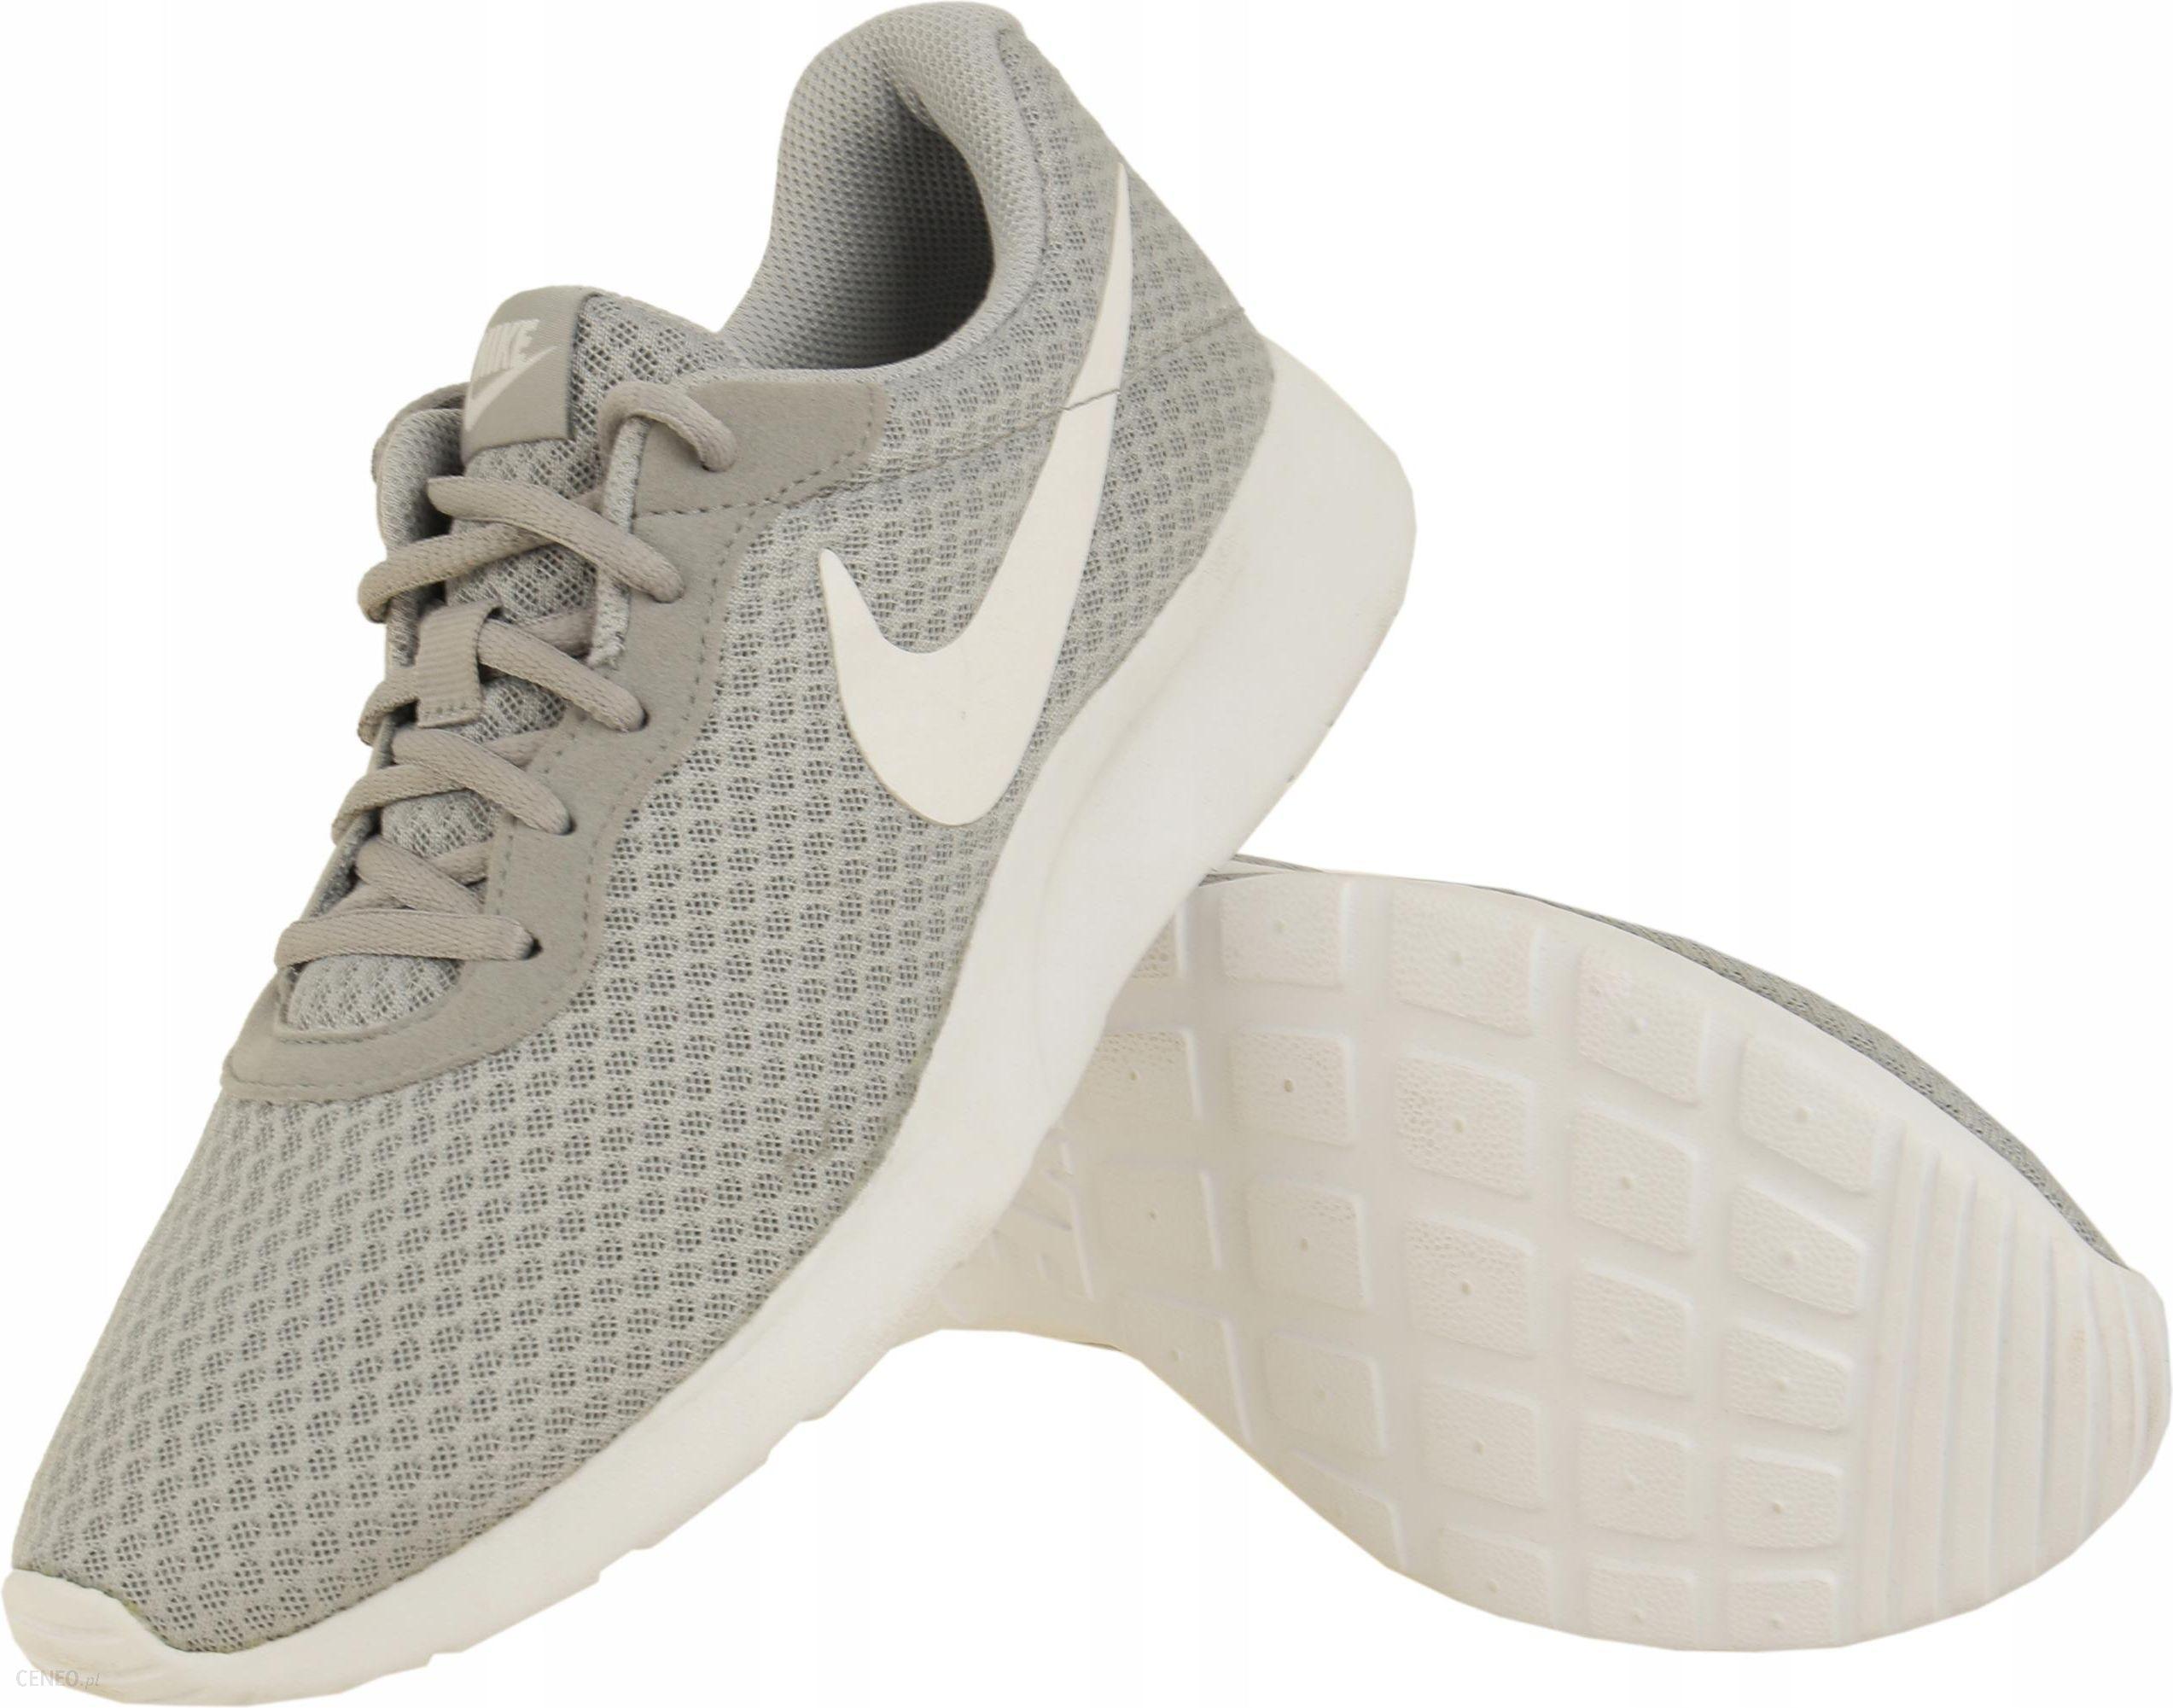 Nike Air Force 1 Nike buty do biegania outlet